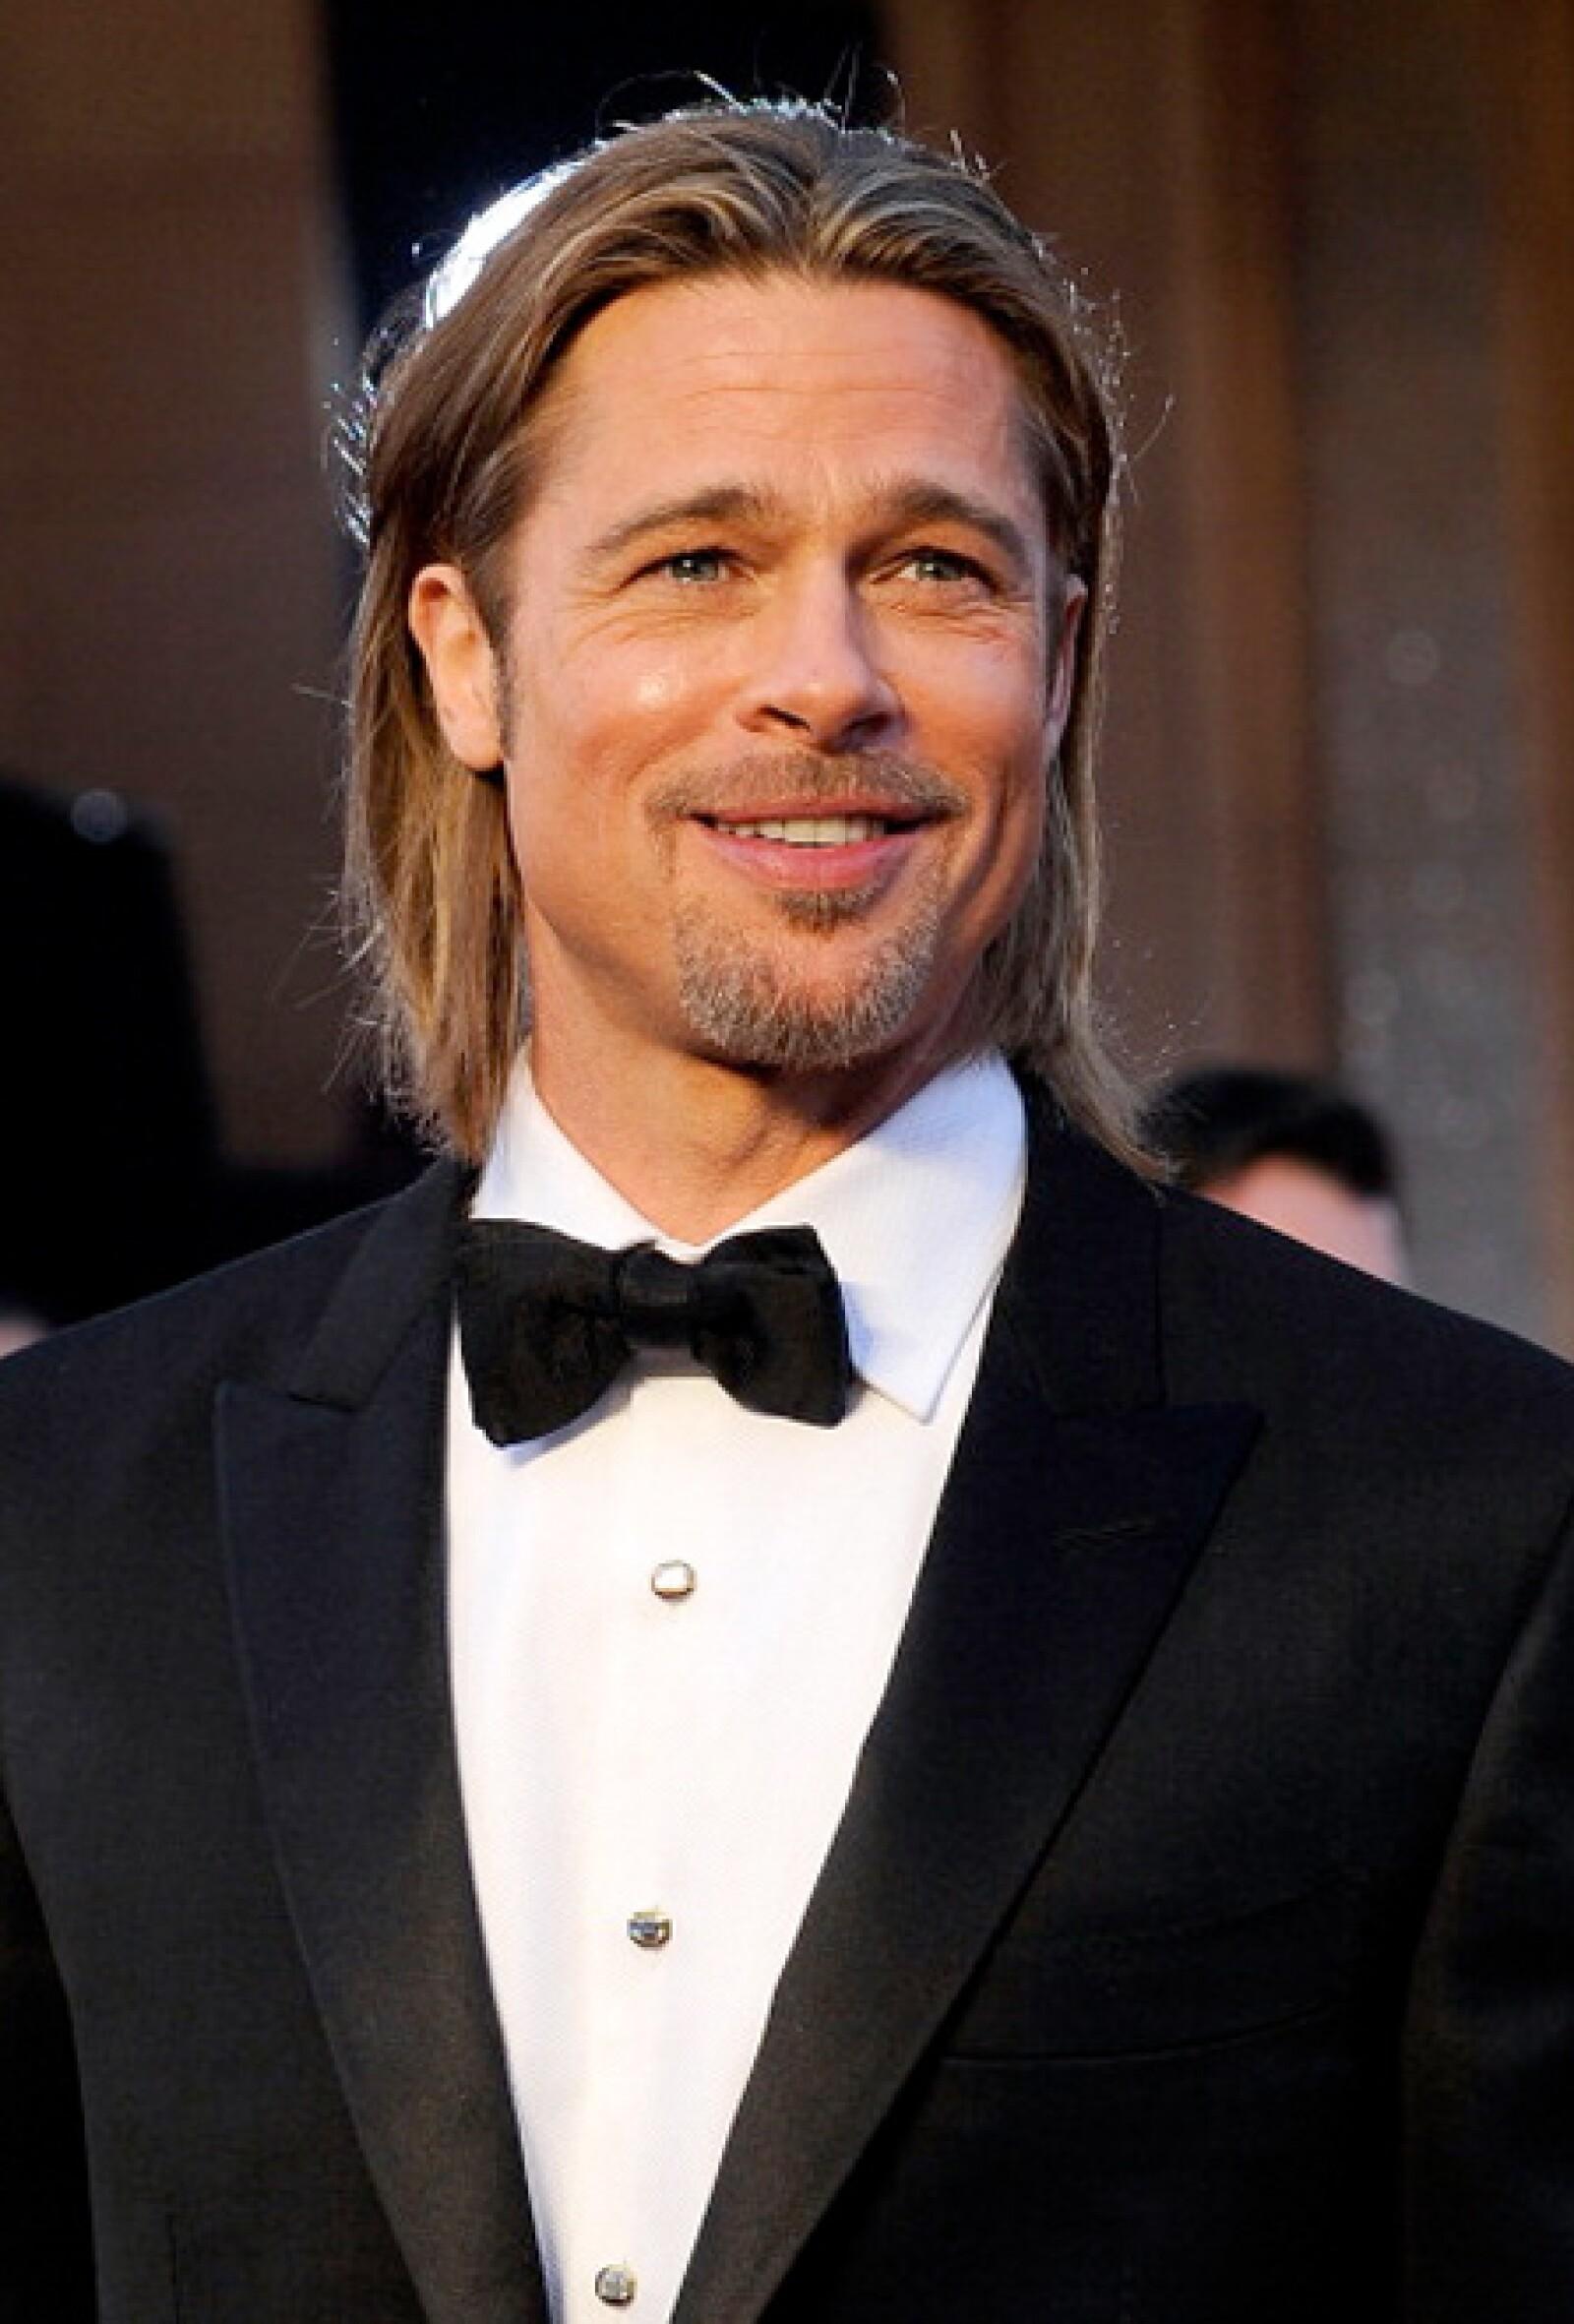 Brad Pitt cumple 50 años el 18 de diciembre.